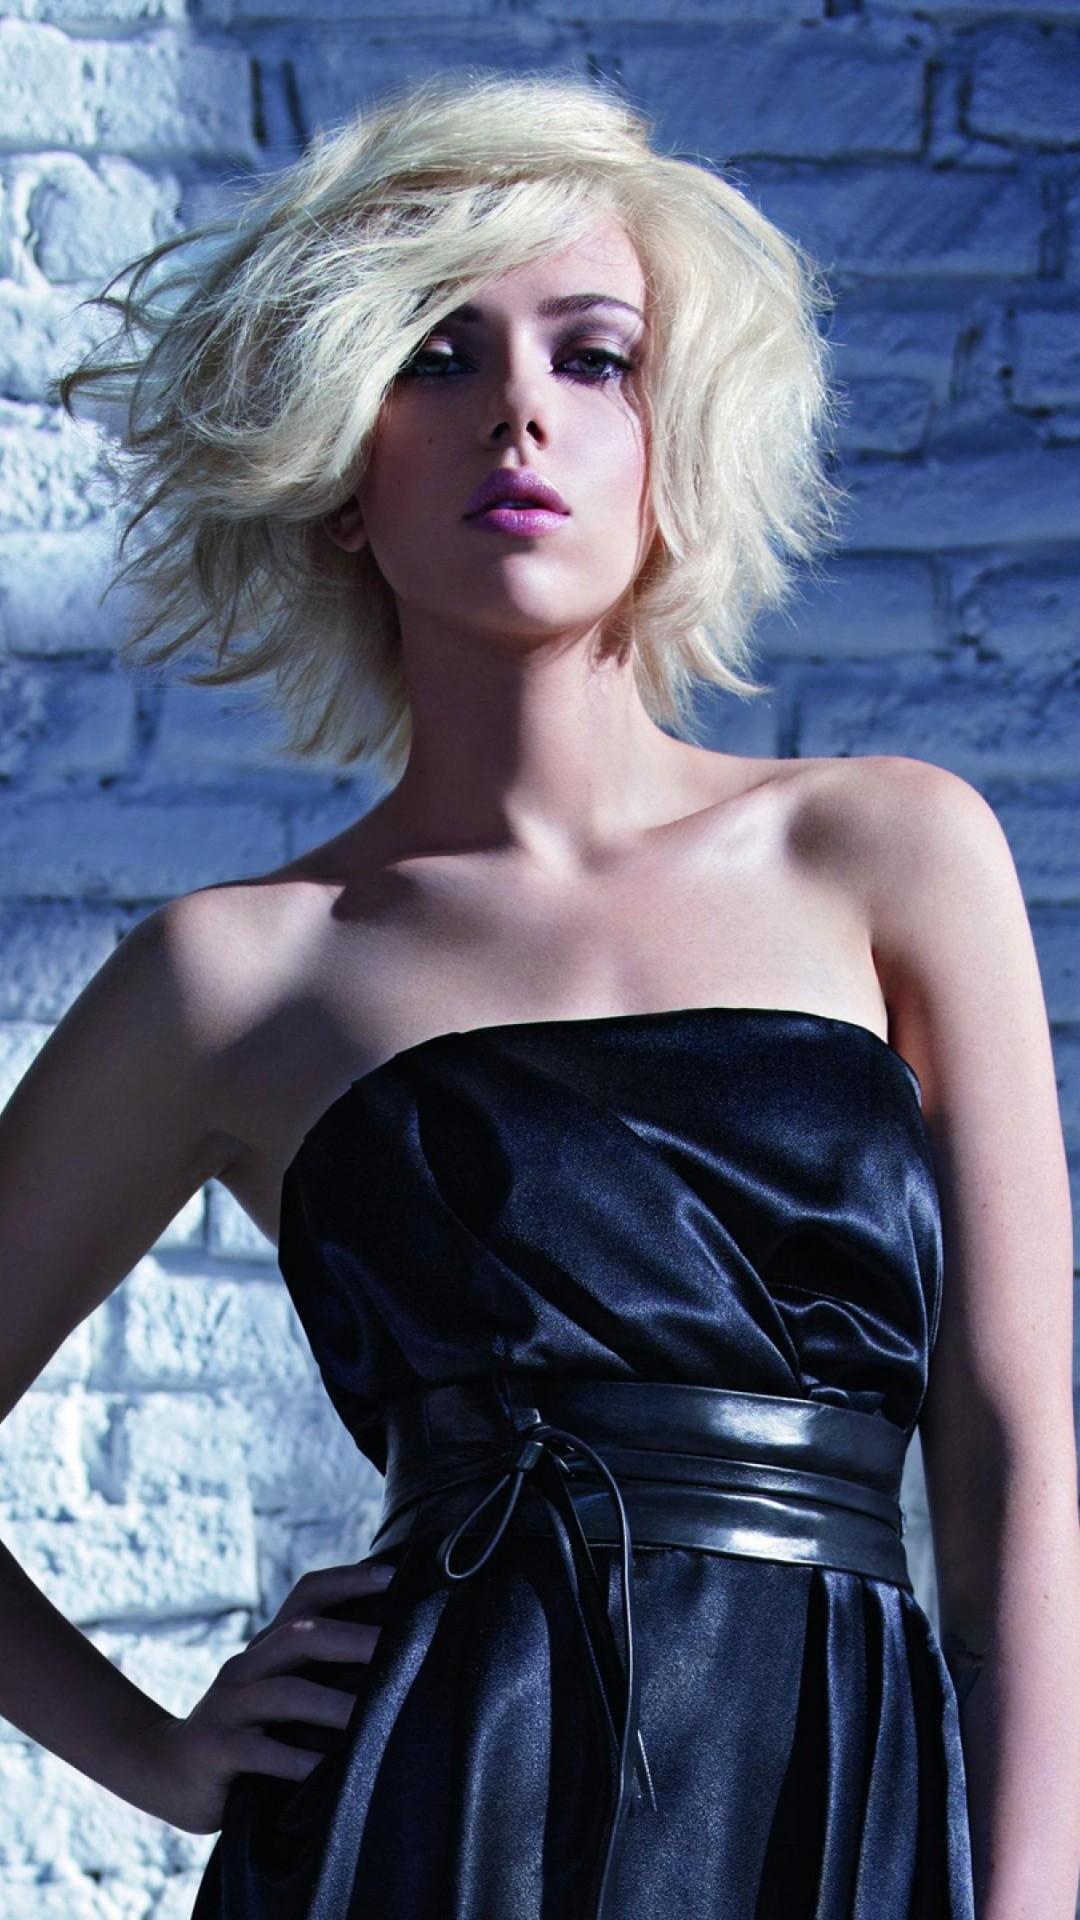 Cool Cars Games >> Wallpaper Scarlett Johansson, Most Popular Celebs, Actress ...